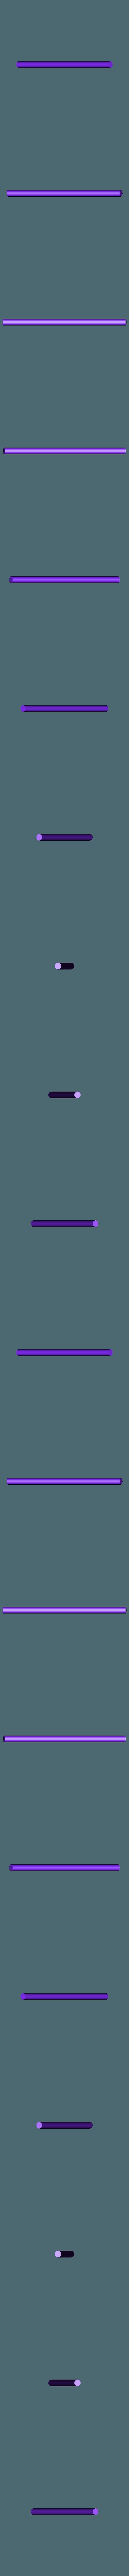 Pièce 9.STL Download STL file Translocator Sombra • 3D print model, Midnight_05